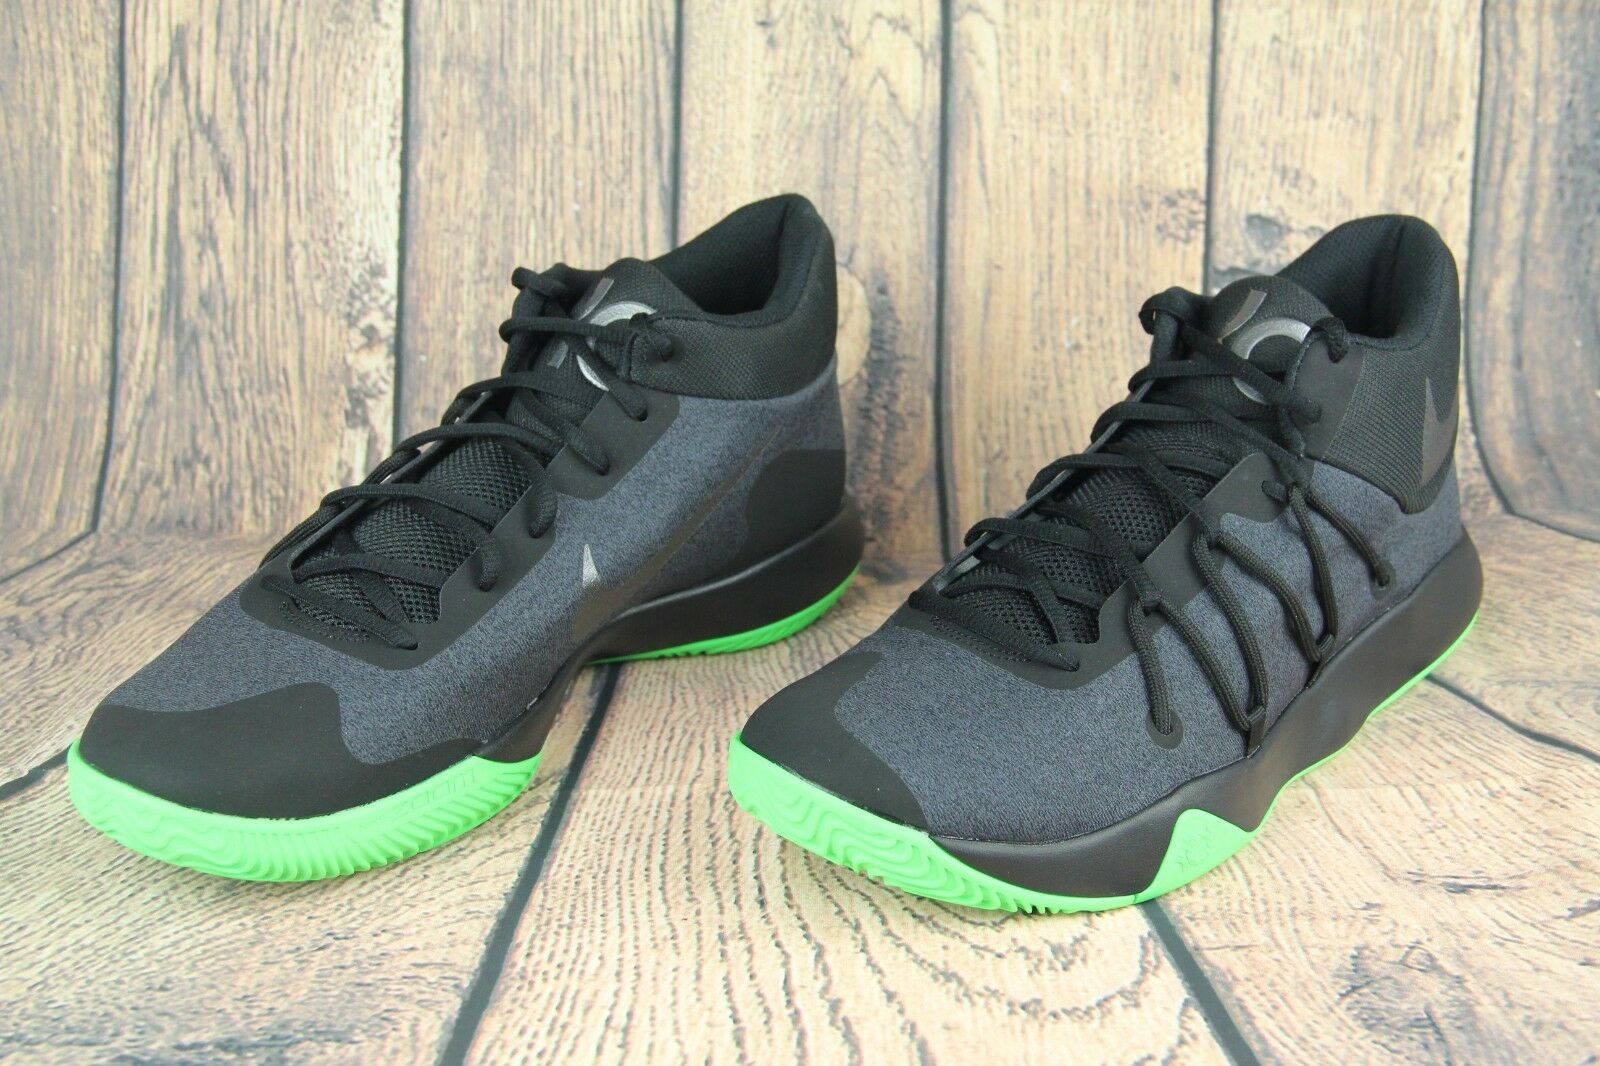 Nike kd trey v scarpe da basket di rabbia nera verde nero 897638-003 Uomo sz 11